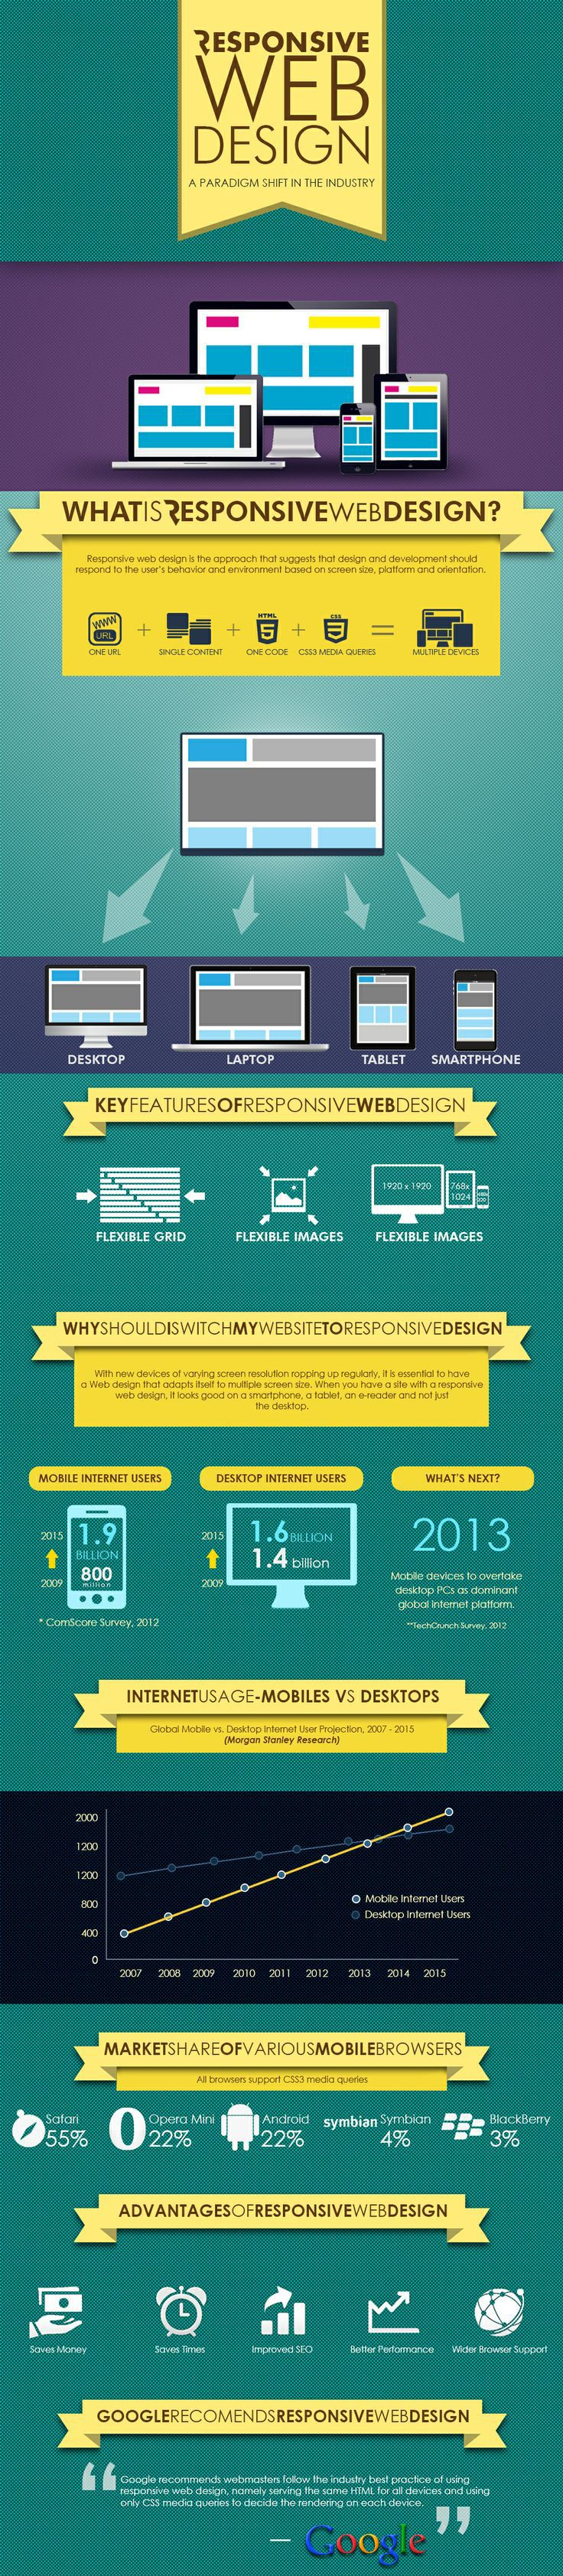 44 best UX + Web Design images on Pinterest | Graph design, Graphics ...